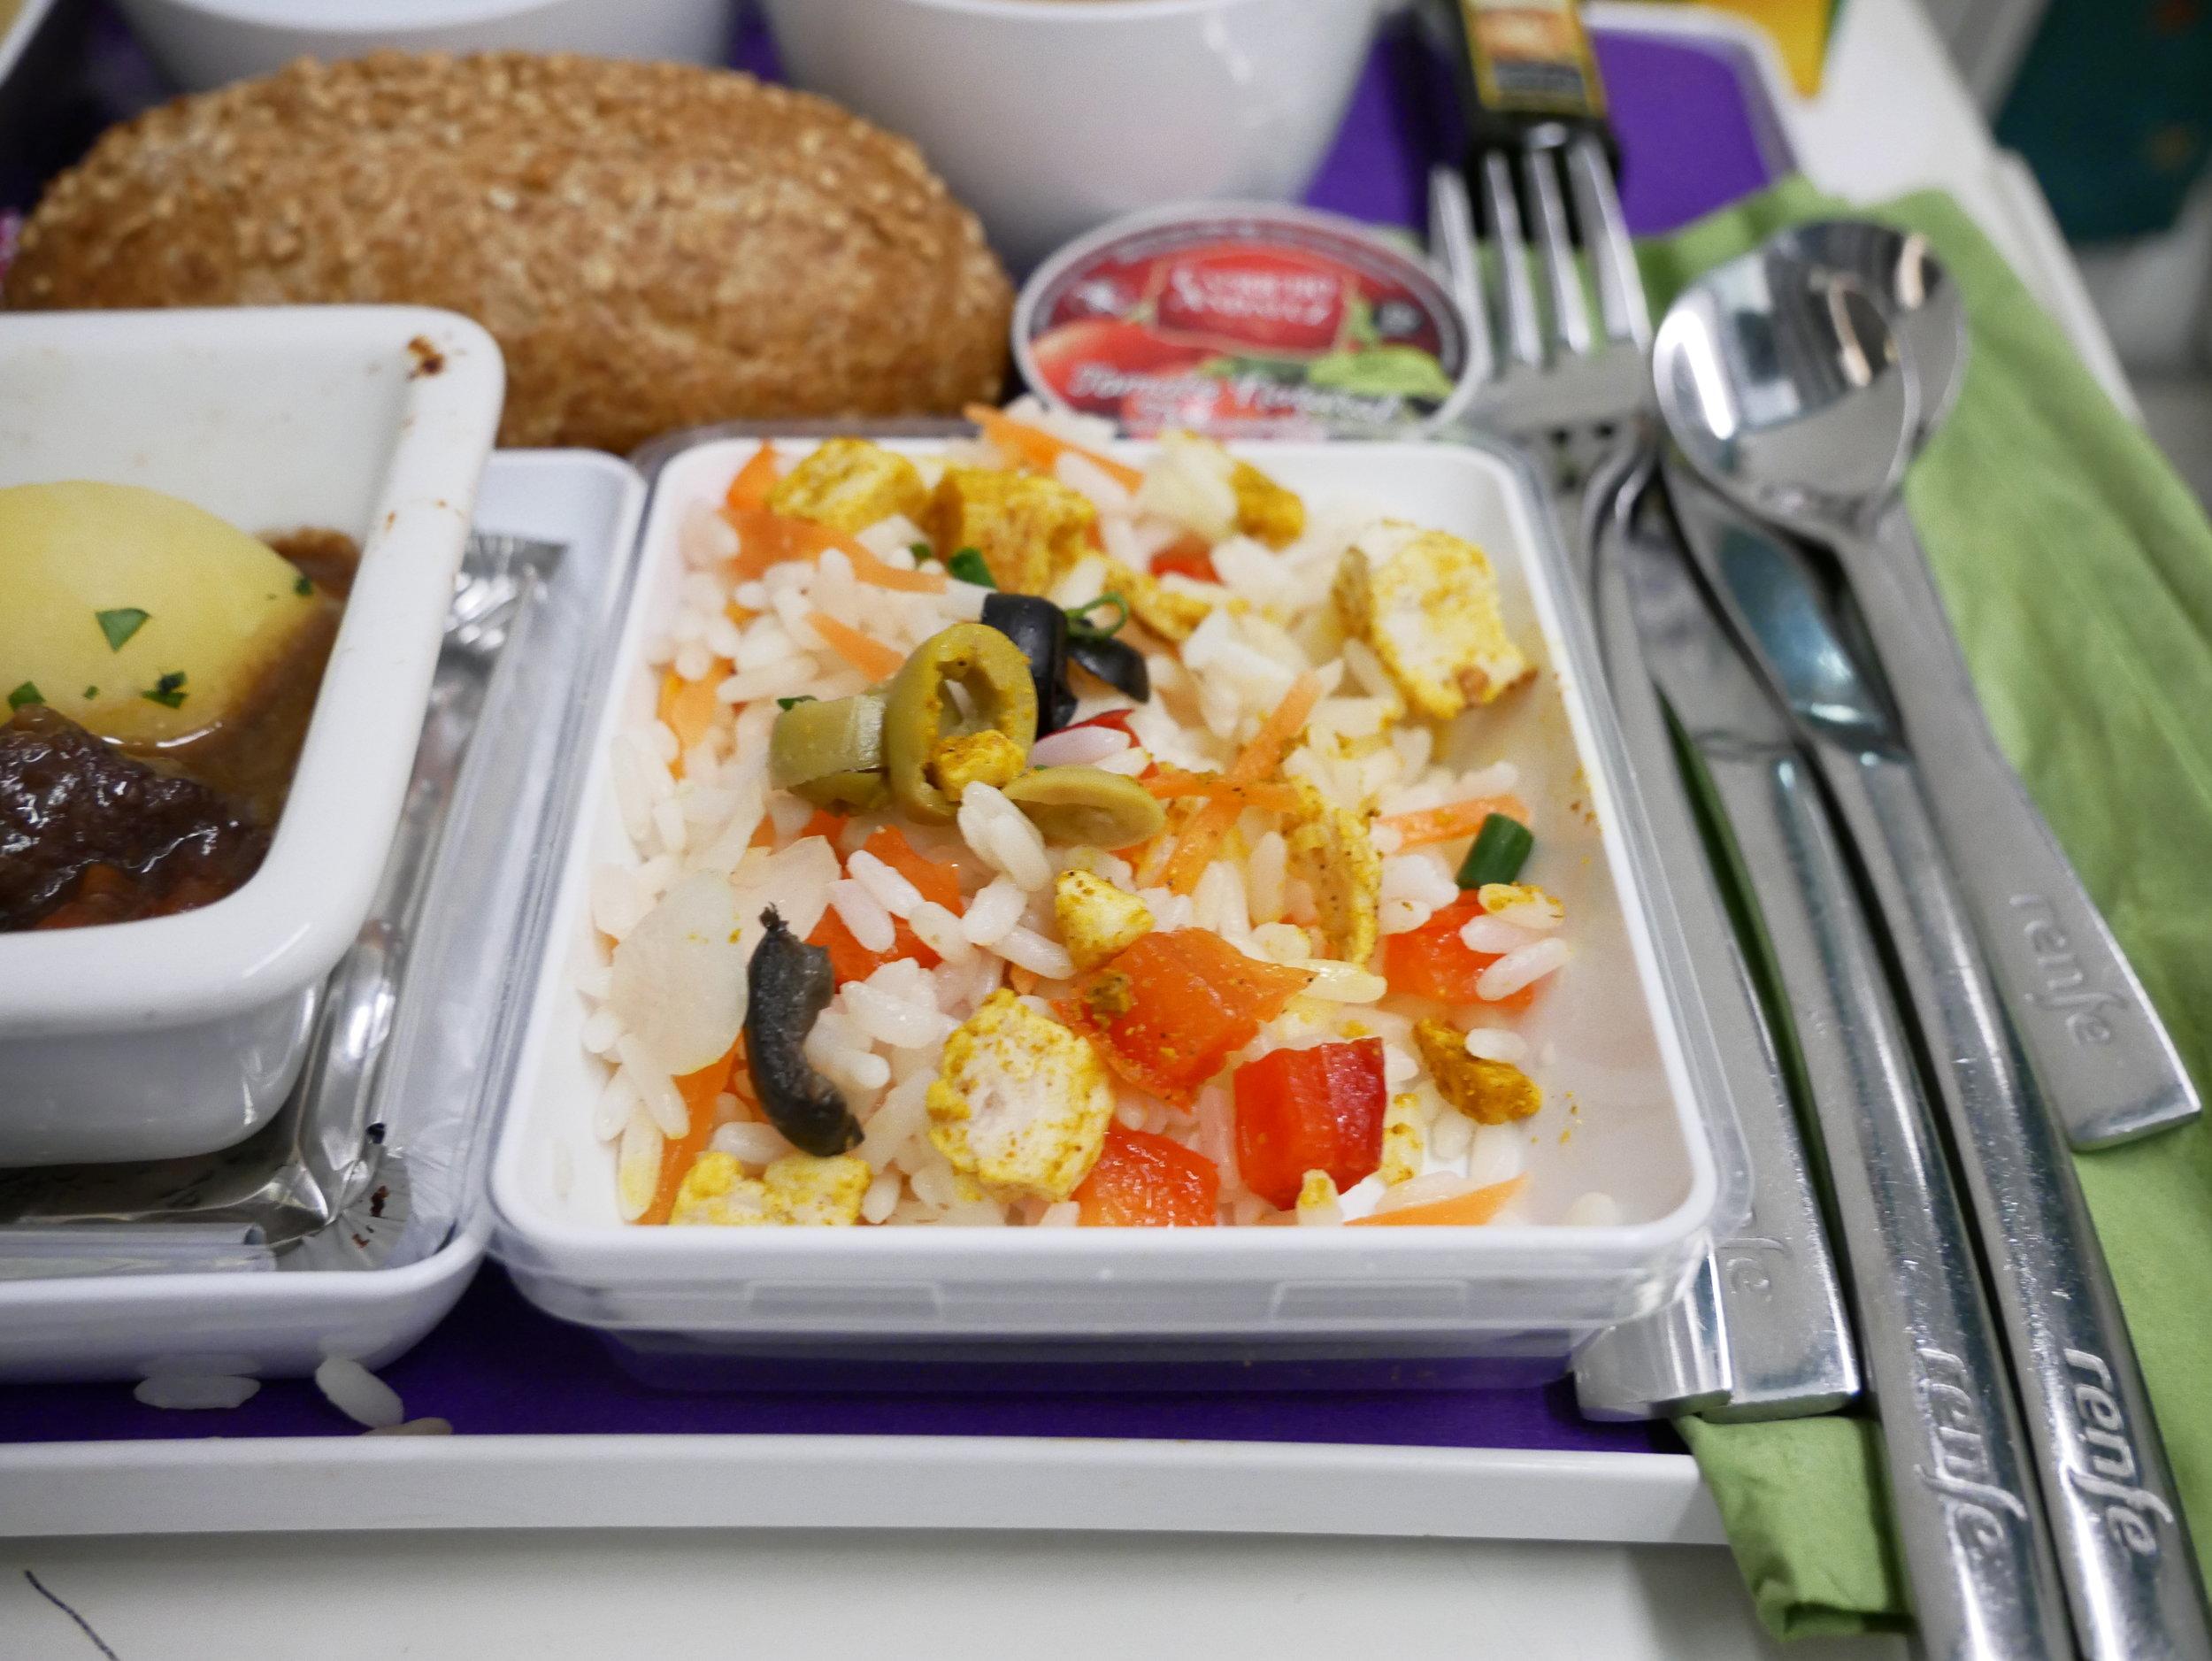 Euromed Preferente rice appetizer